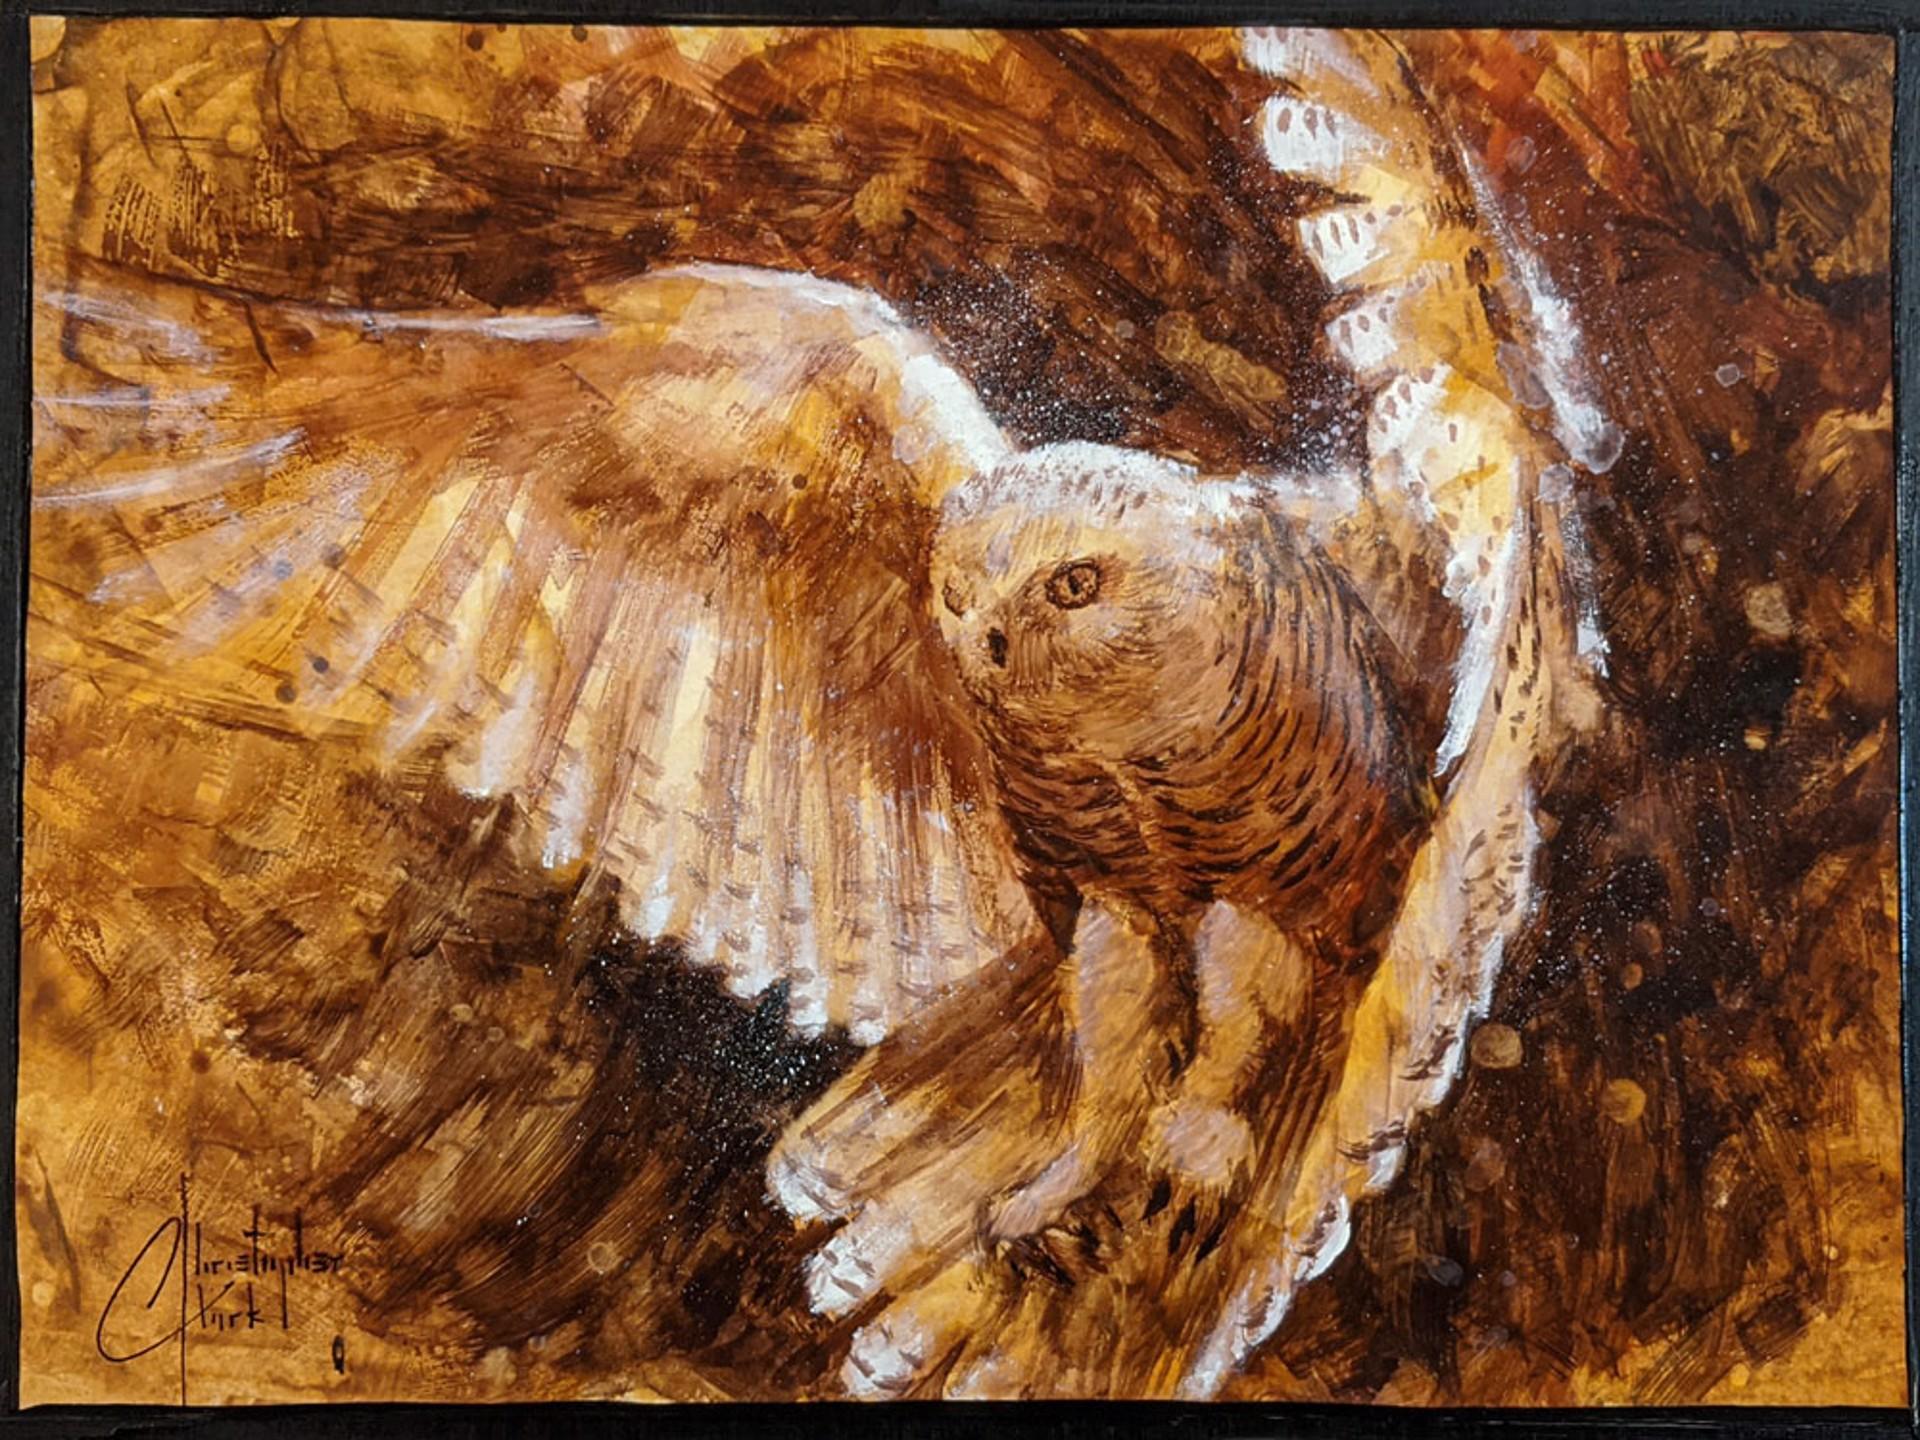 Barn Owl by Christopher Clark